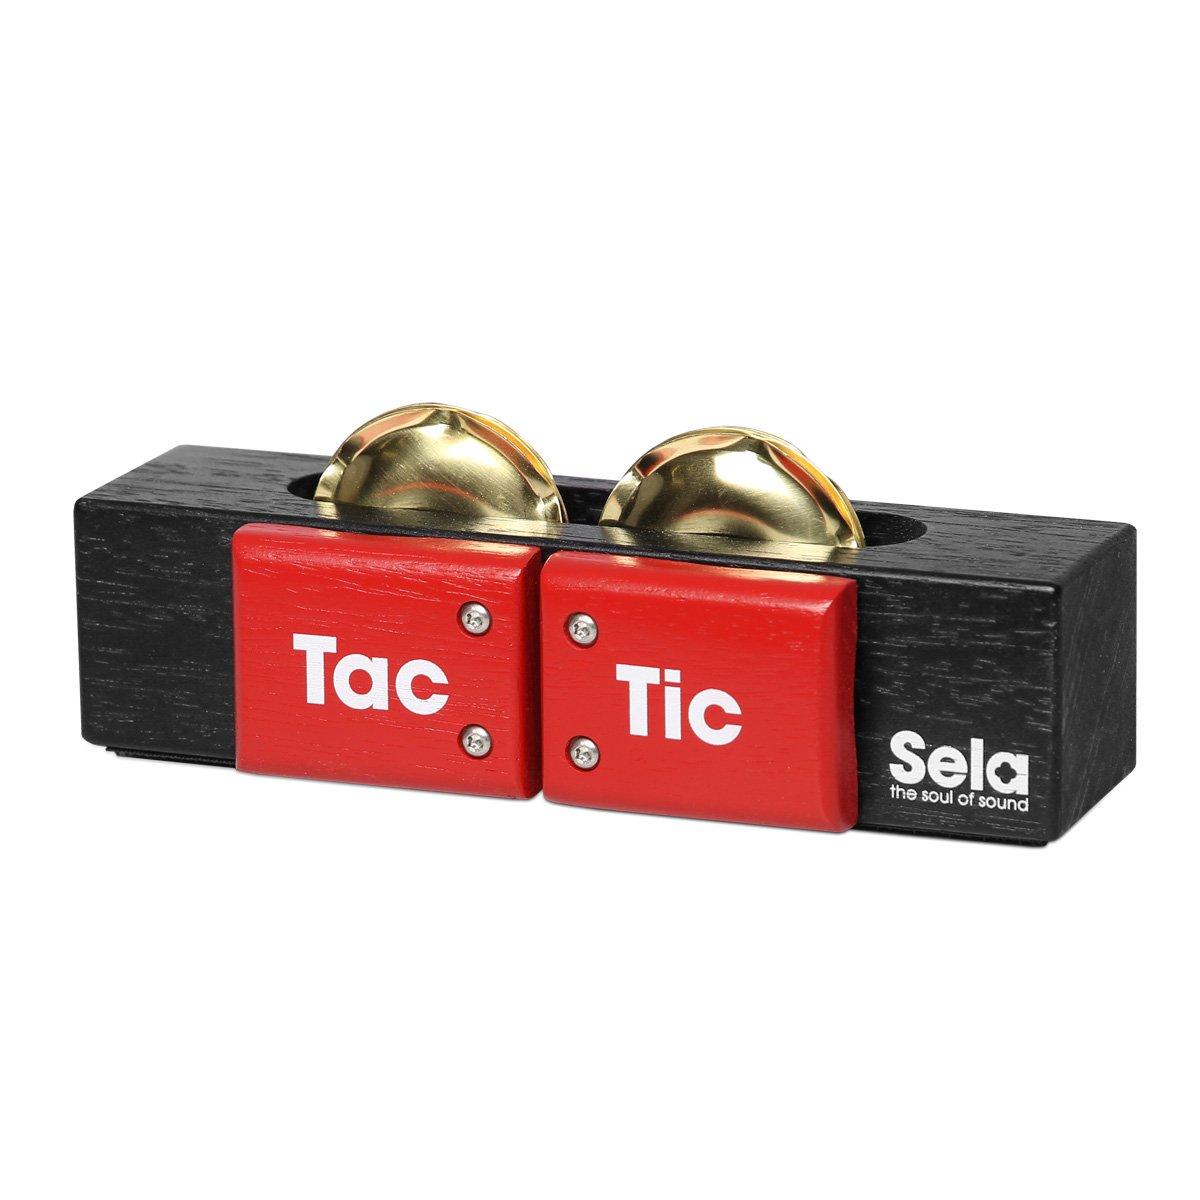 Sela SE 055 Tac Tic 3-in-1 Multi-Percussion Tool for Cajon, Conga, Djembe, Hang Drum